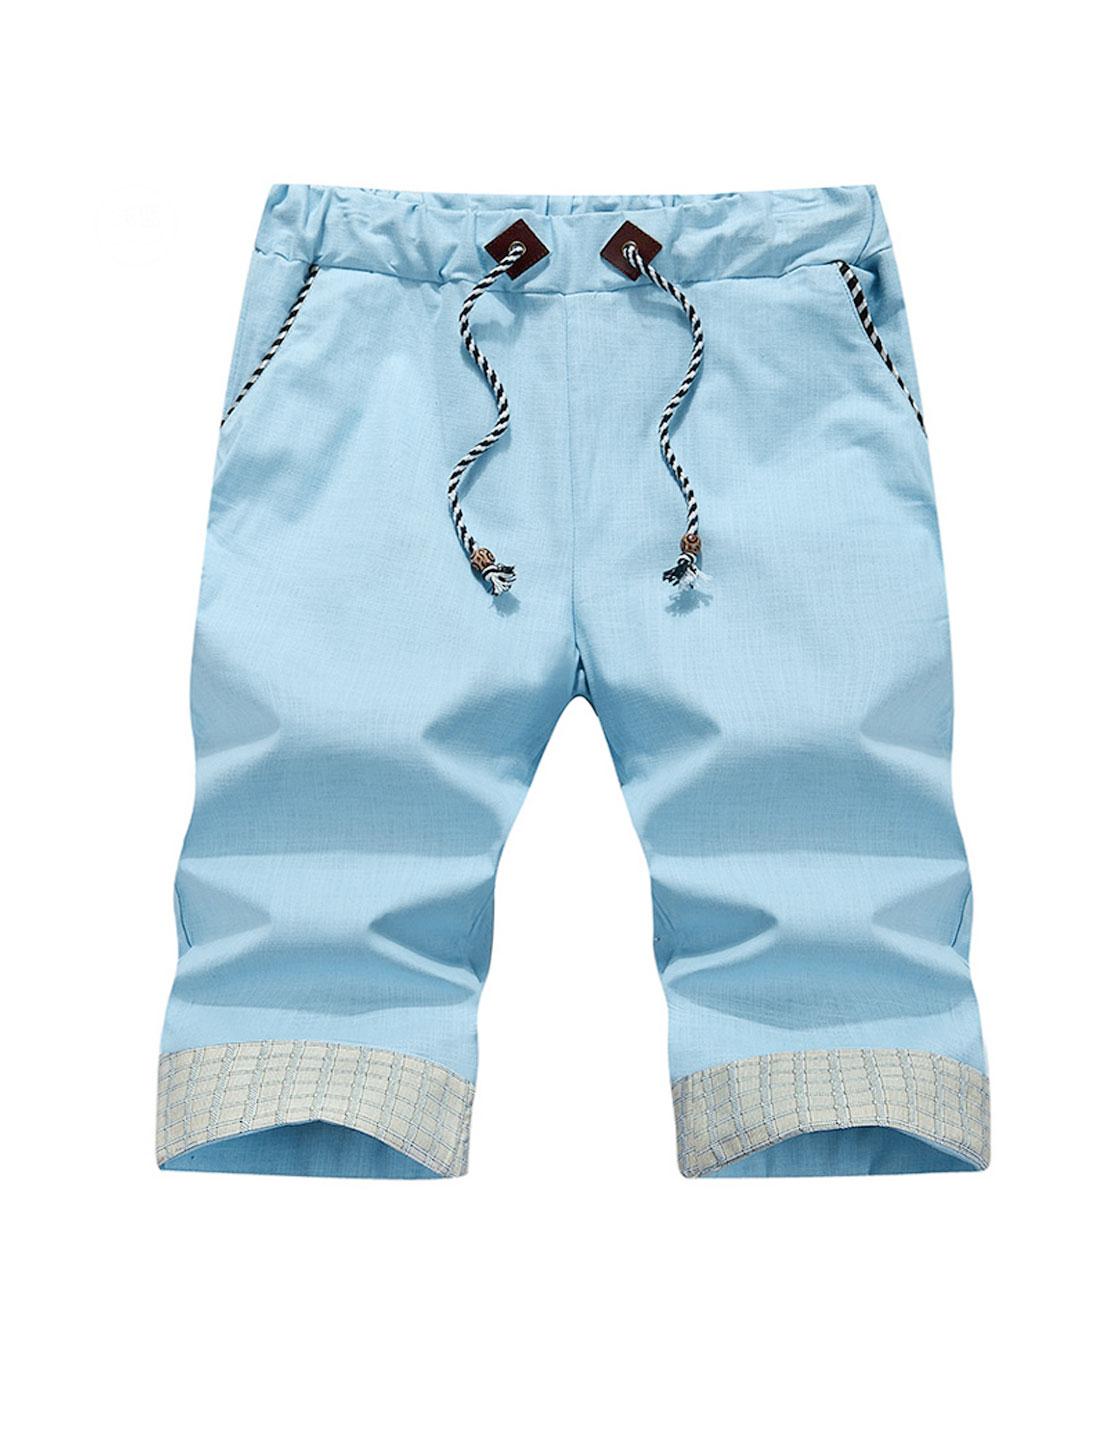 Men Drawstring Waist Plaids Detail Casual Shorts Sky Blue W32